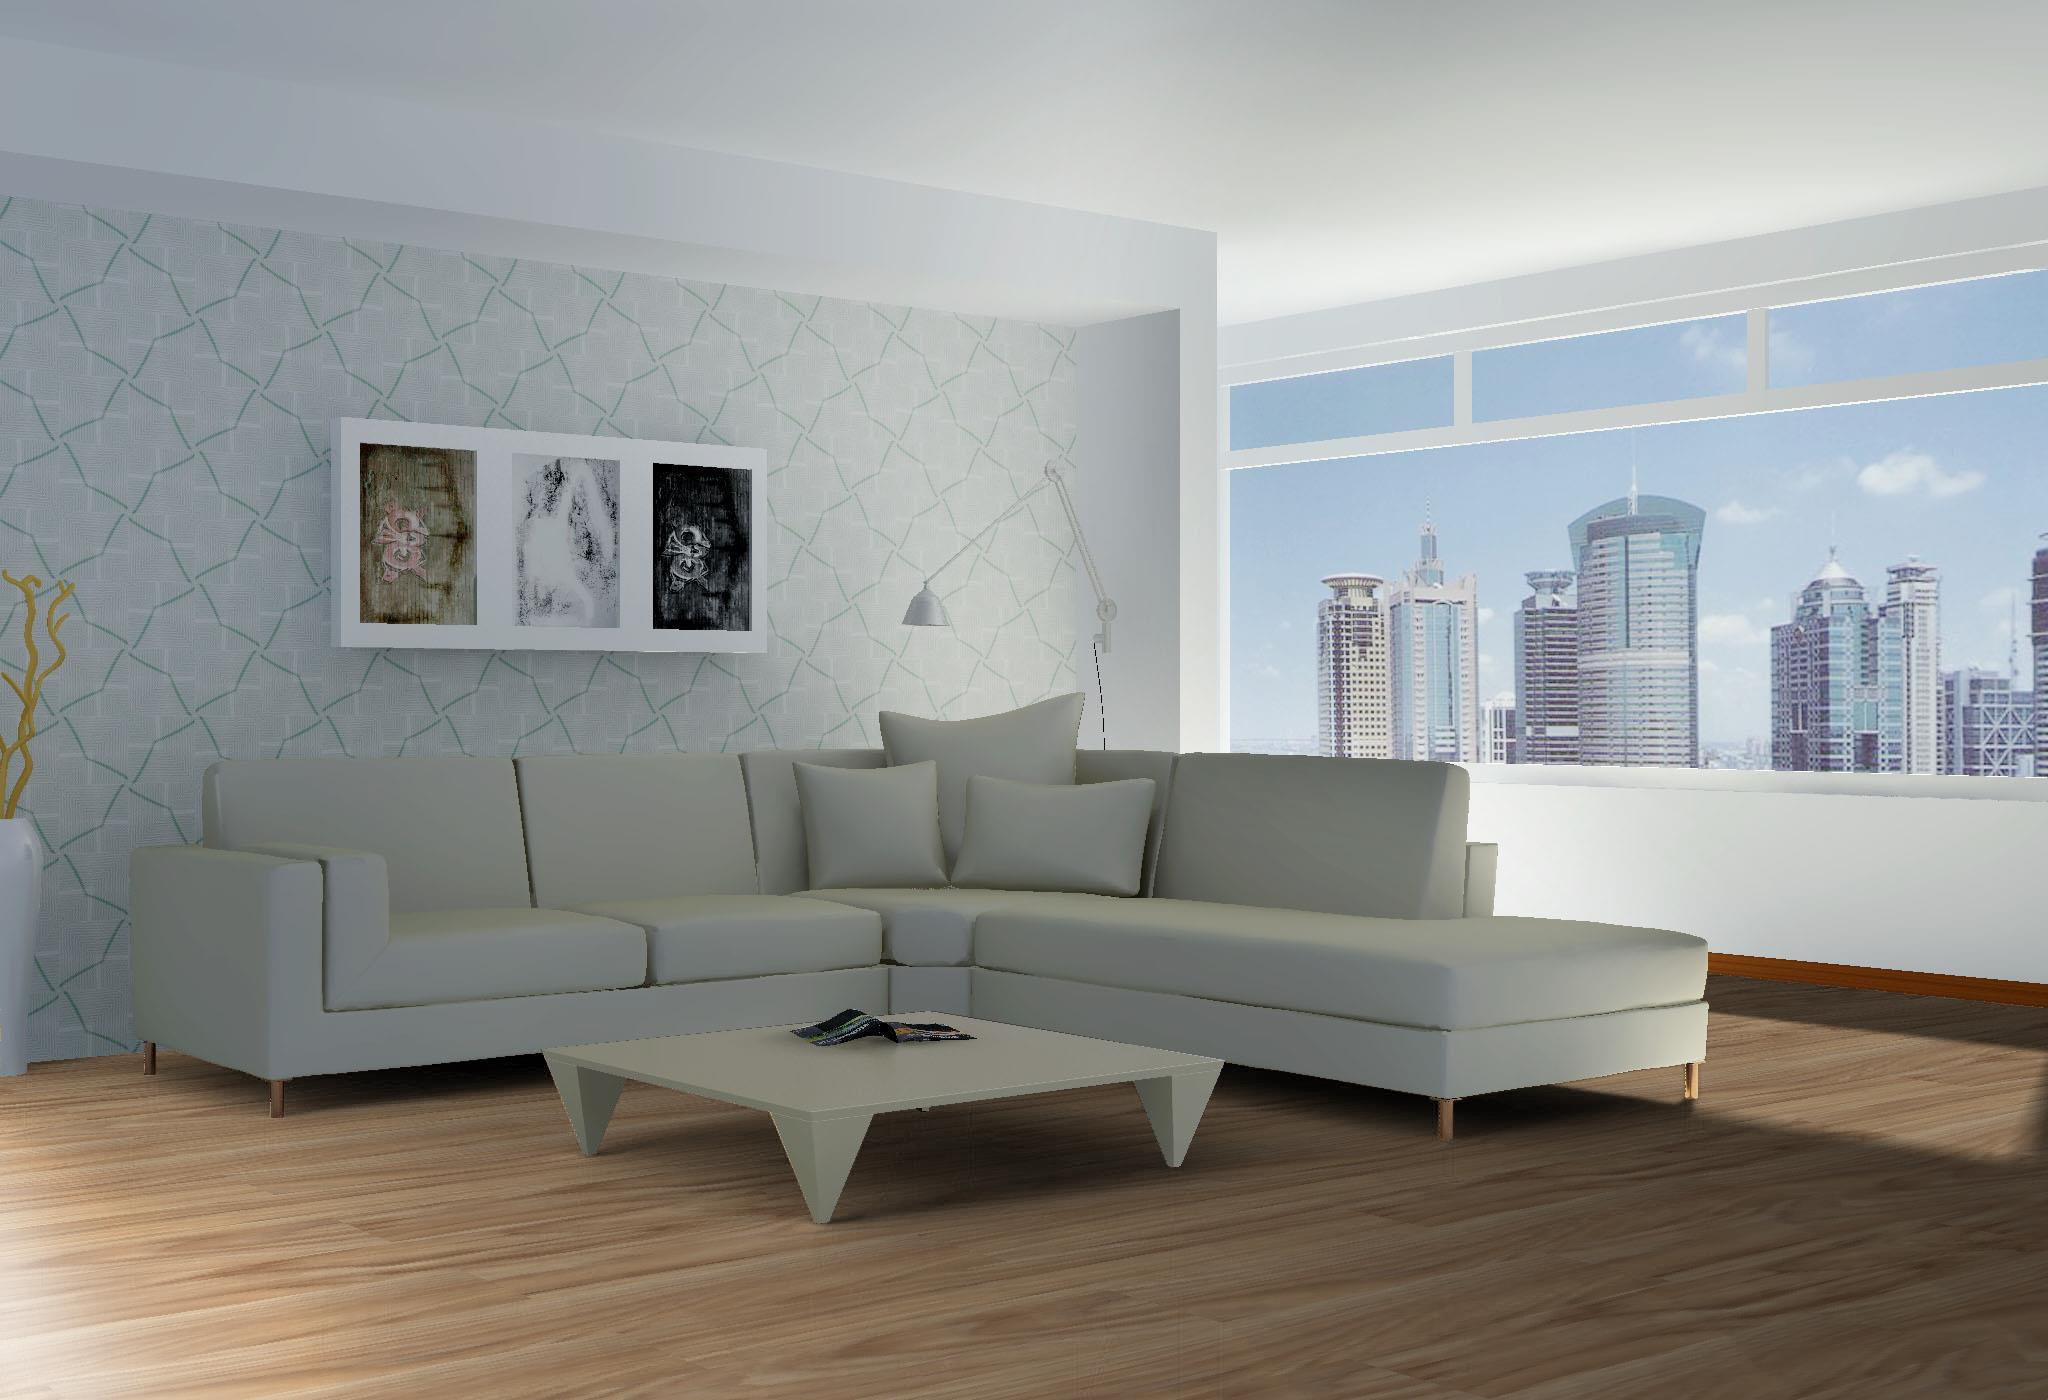 Wood Texture Pvc Vinyl Flooring Gym Bedroom Available